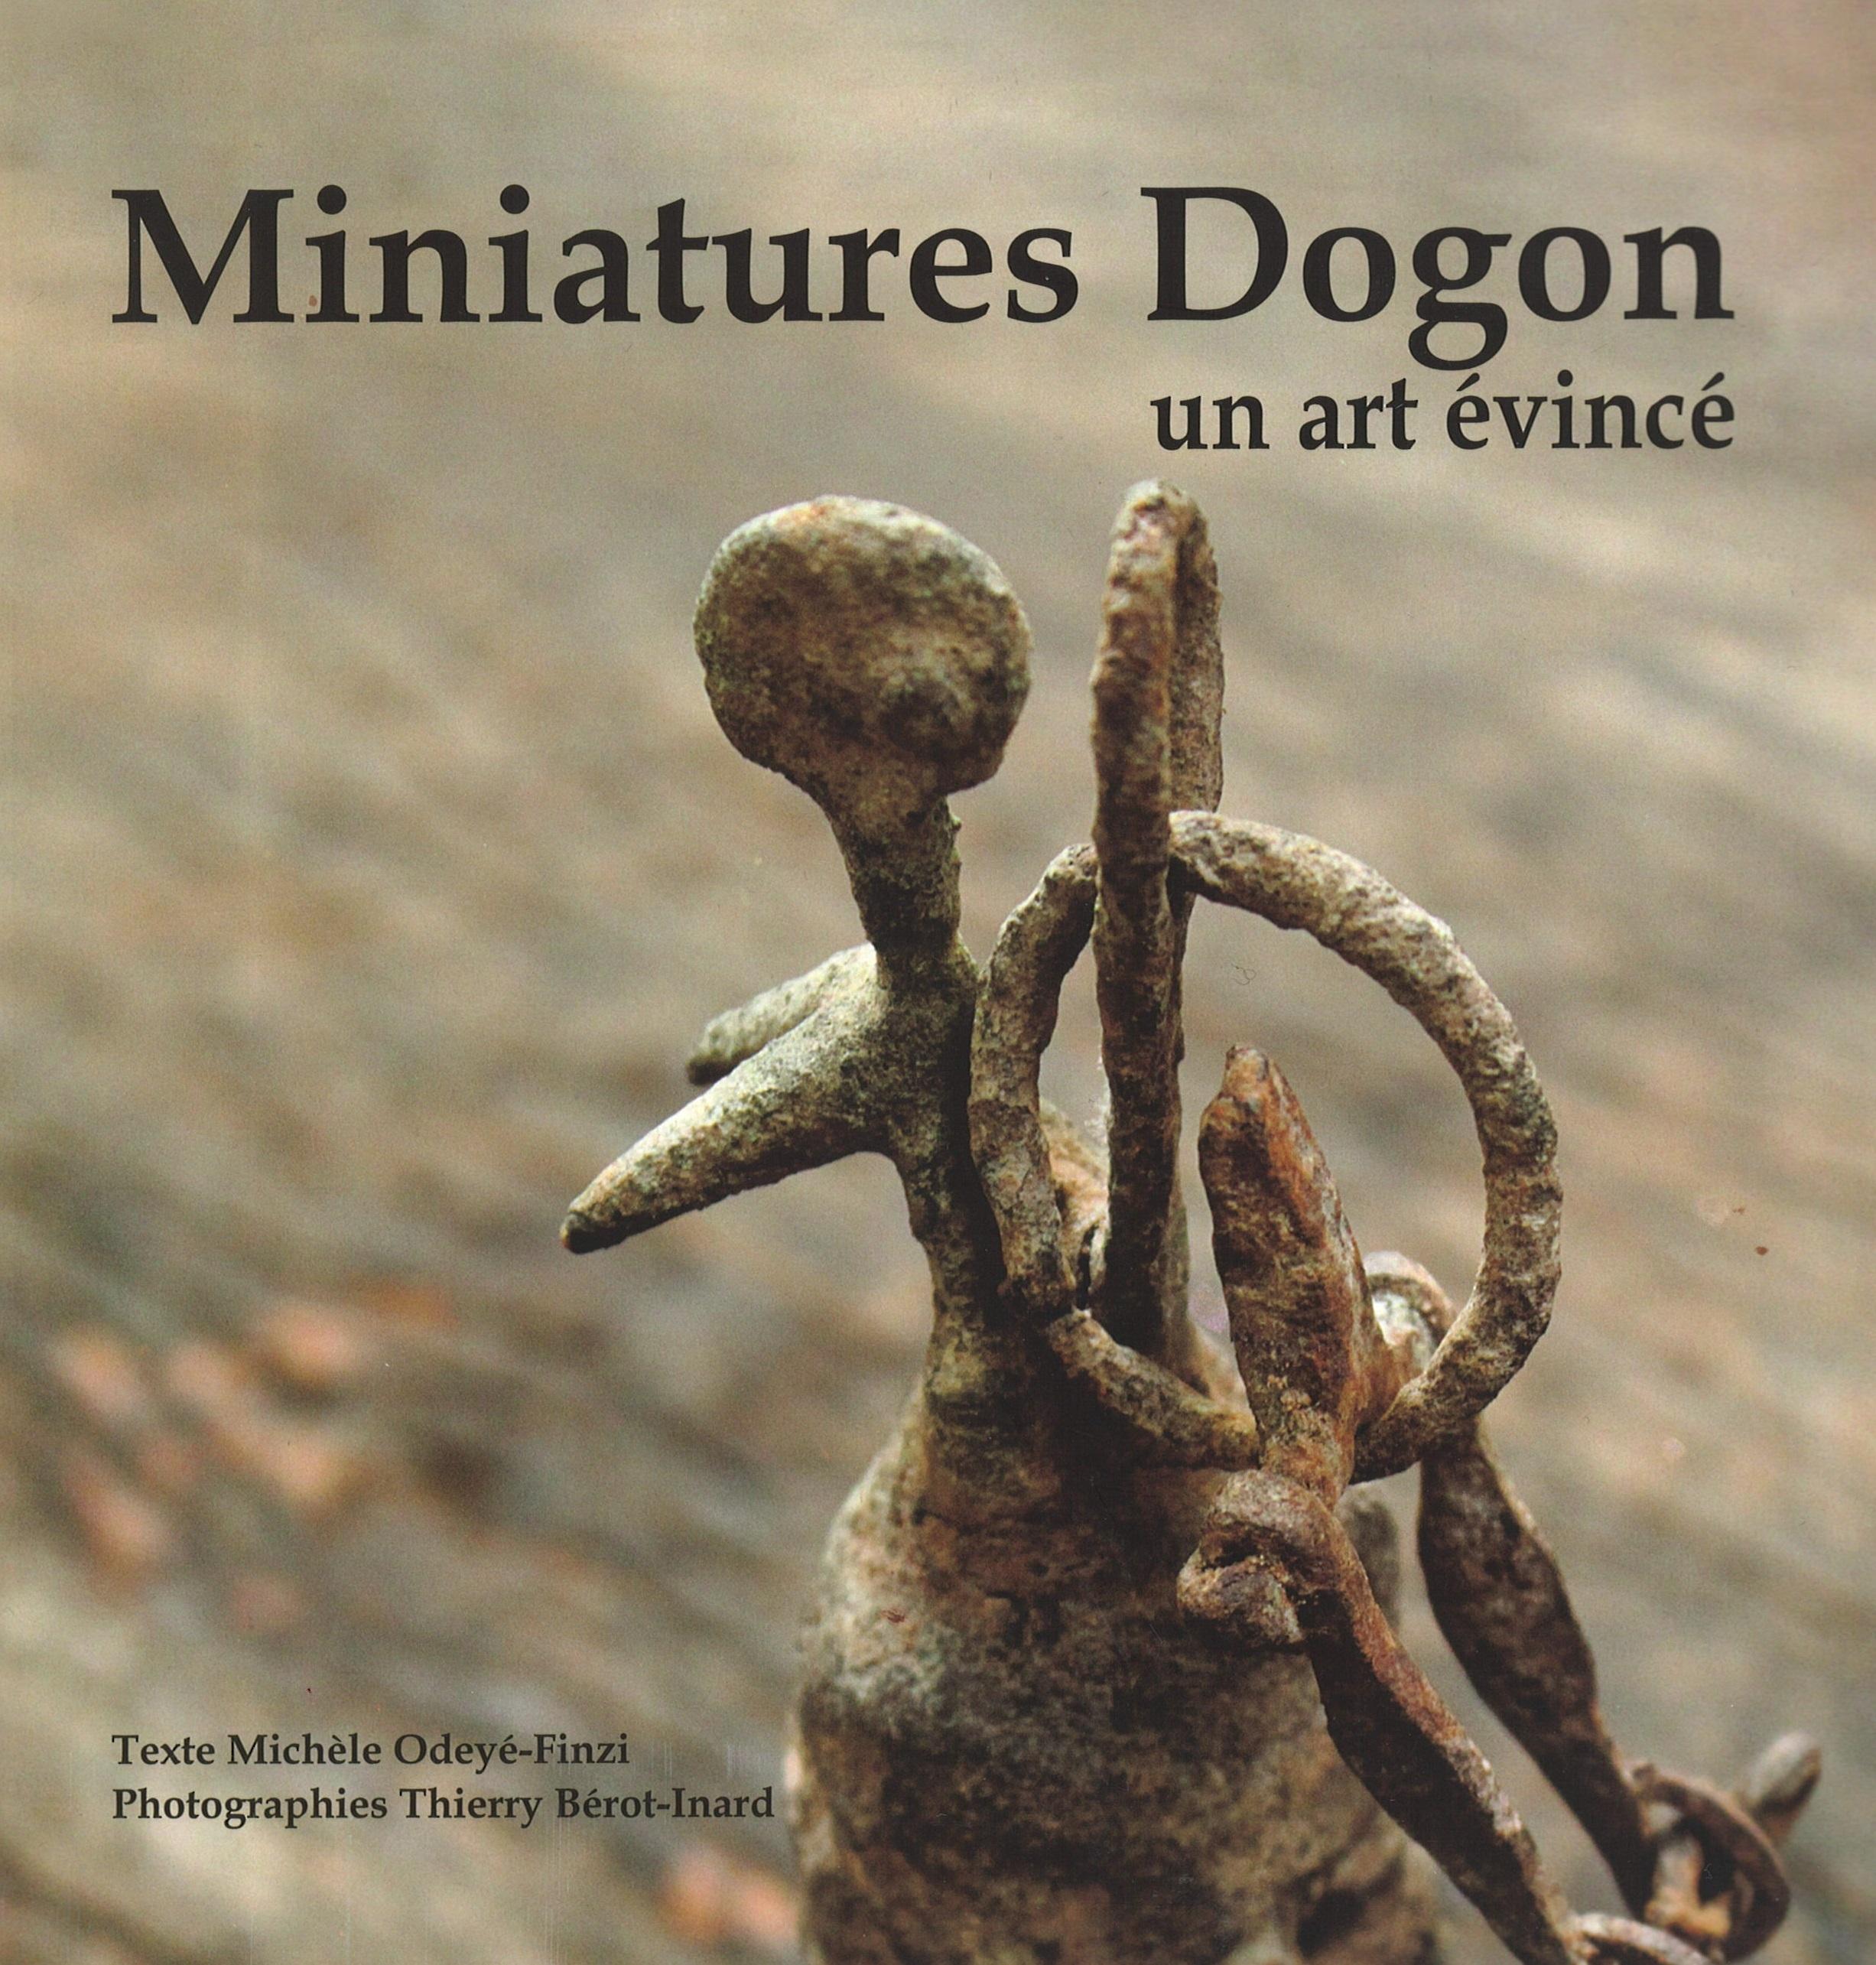 MINIATURES DOGON, UN ART EVINCE